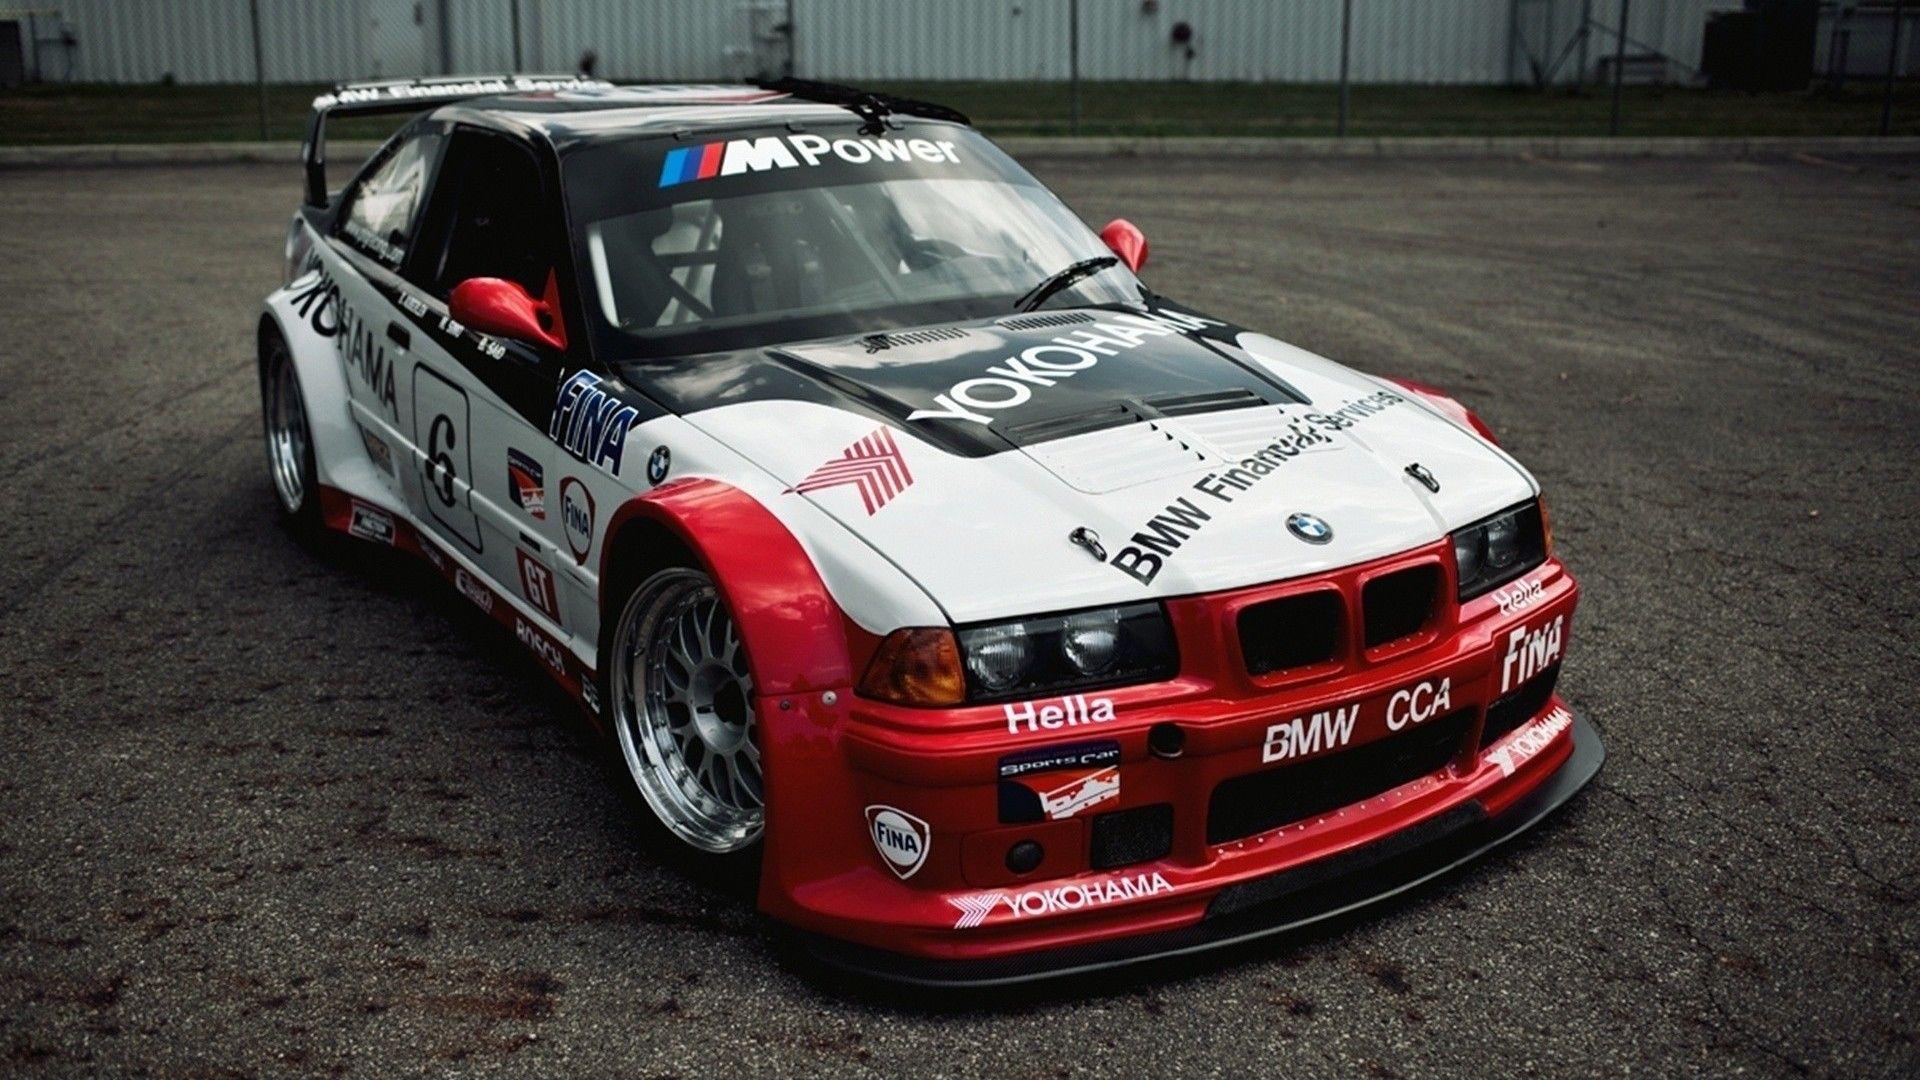 e36-m3-rally-car-power-bmw-1920x1080-wallpaper42834.jpg ...